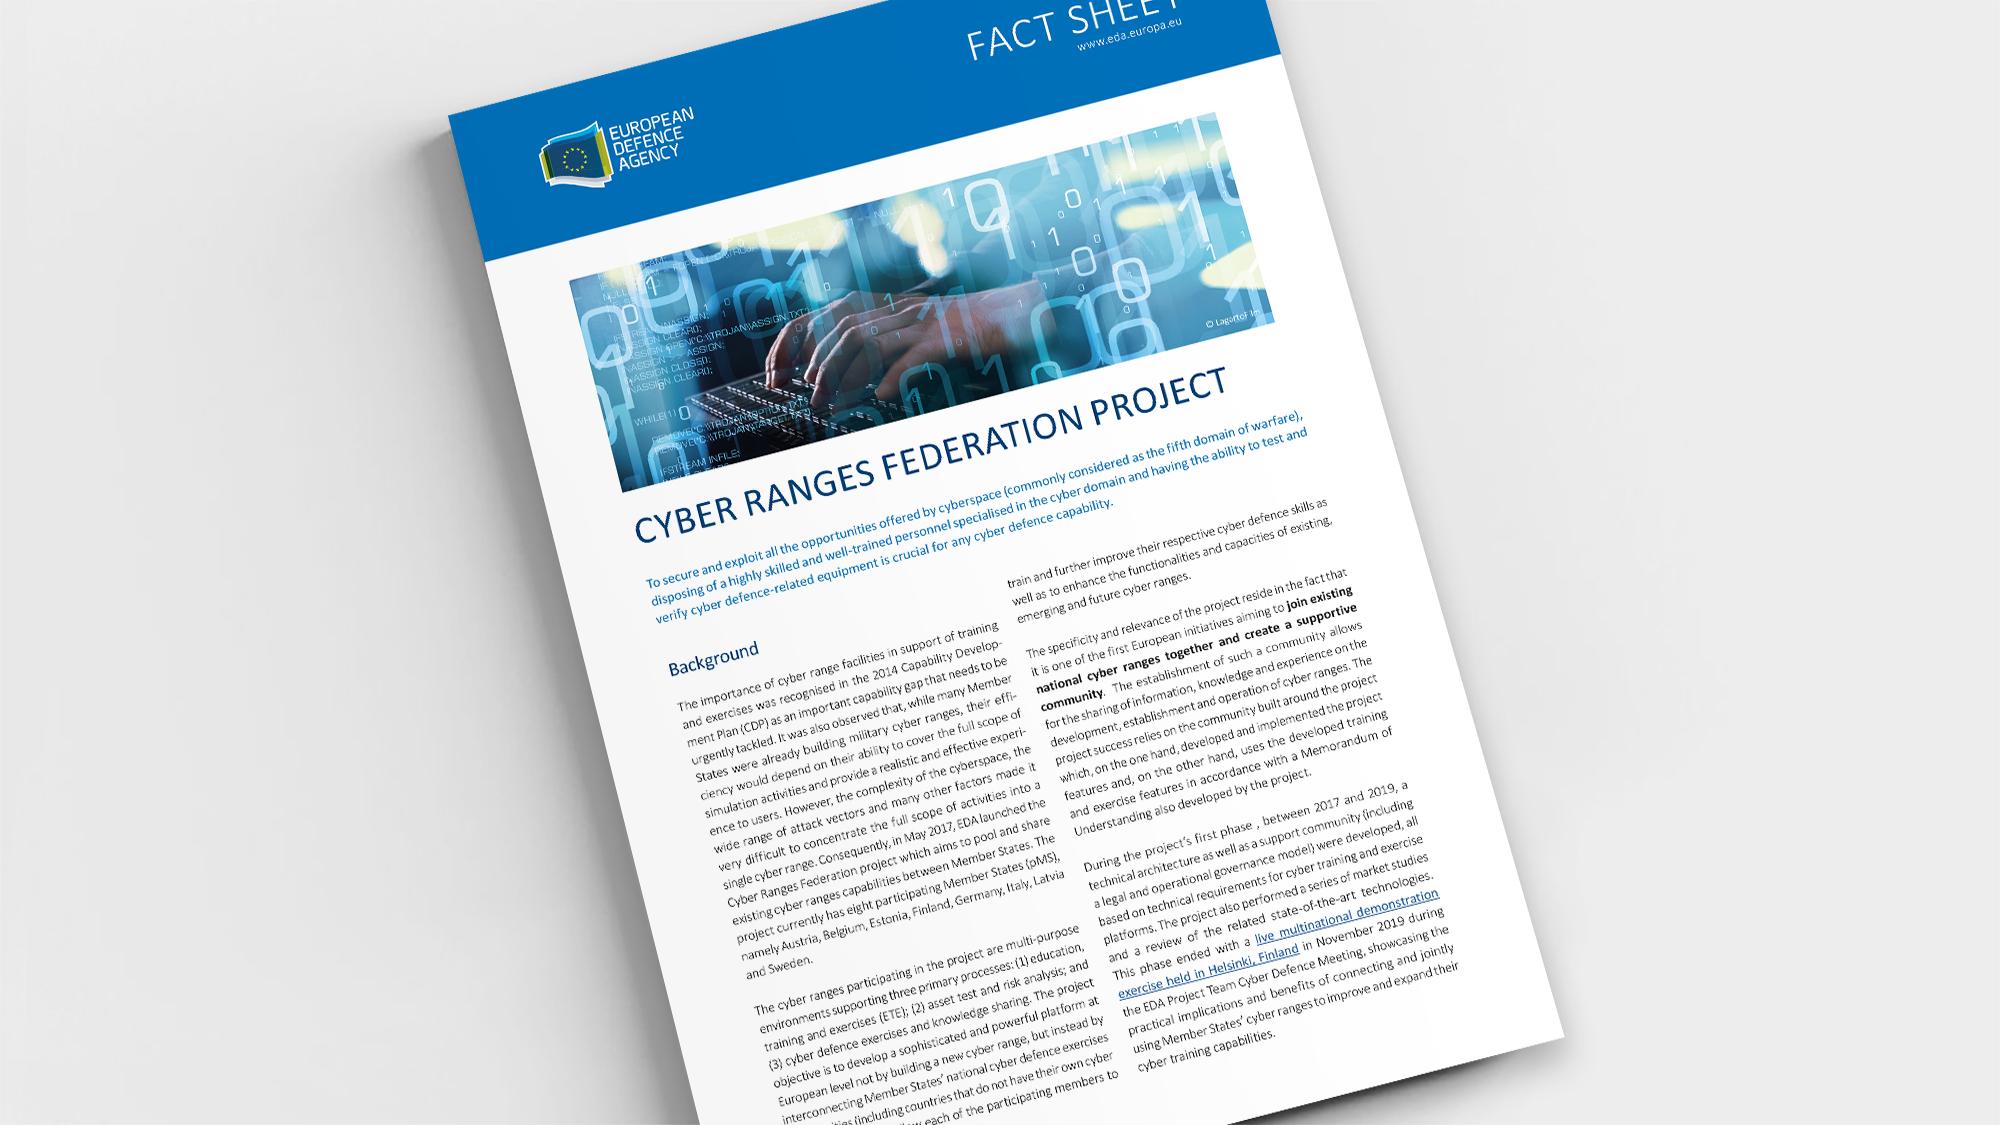 Factsheet-Cyber-Ranges